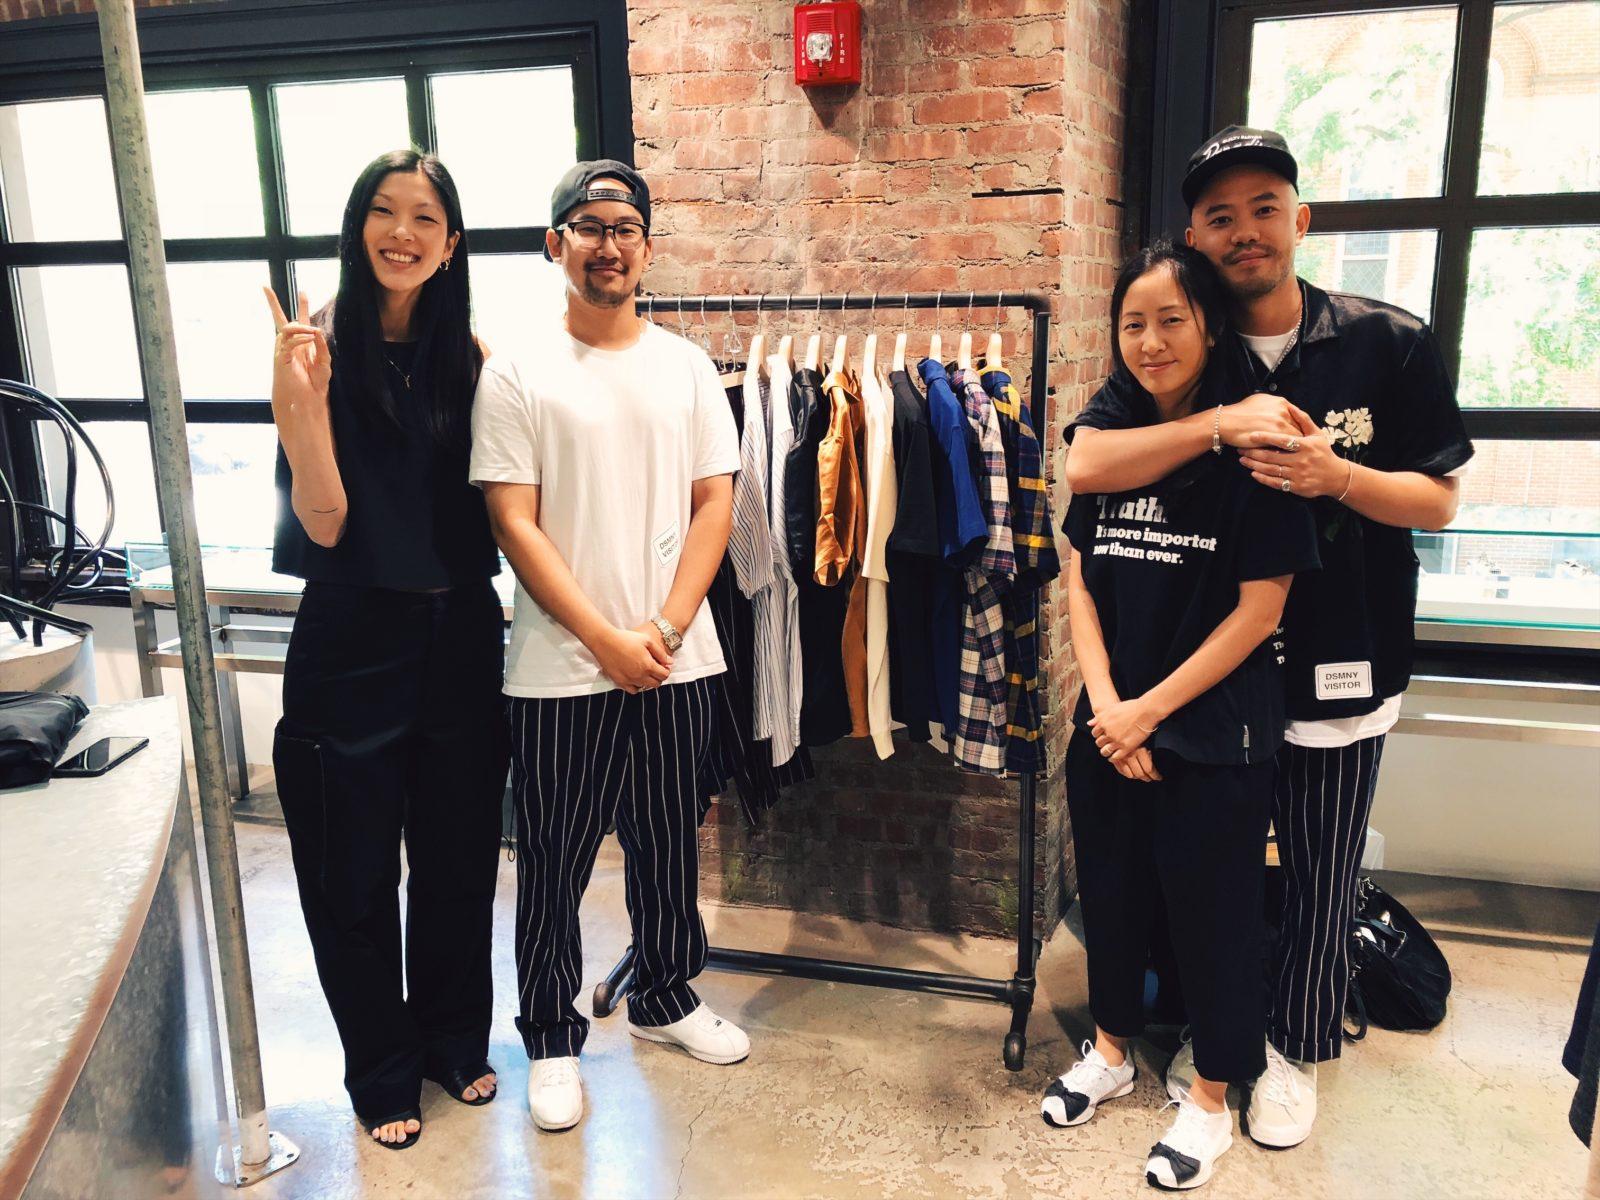 Left to Right: Julia Chu, Calvin Nguyen, Christina Chou, Caleb Lin